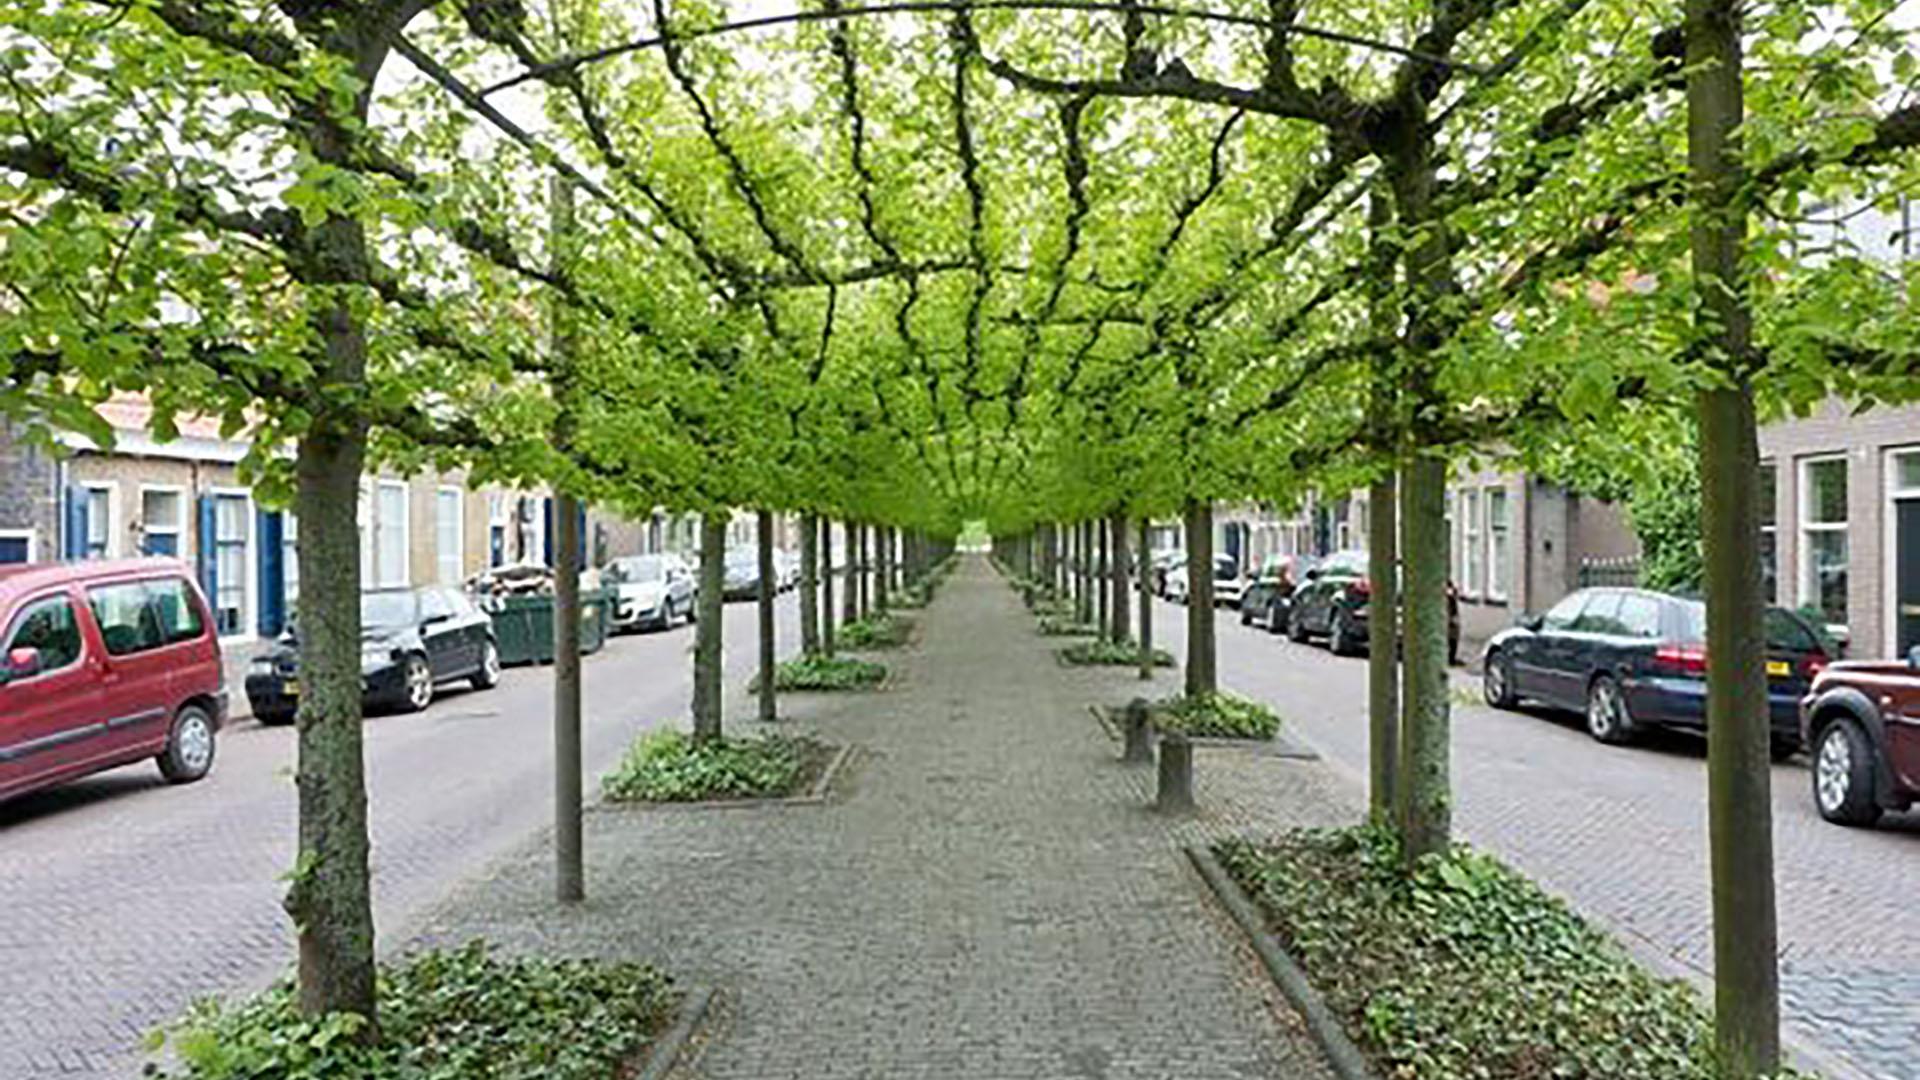 05 - Bulevar en Willemstad, Holanda